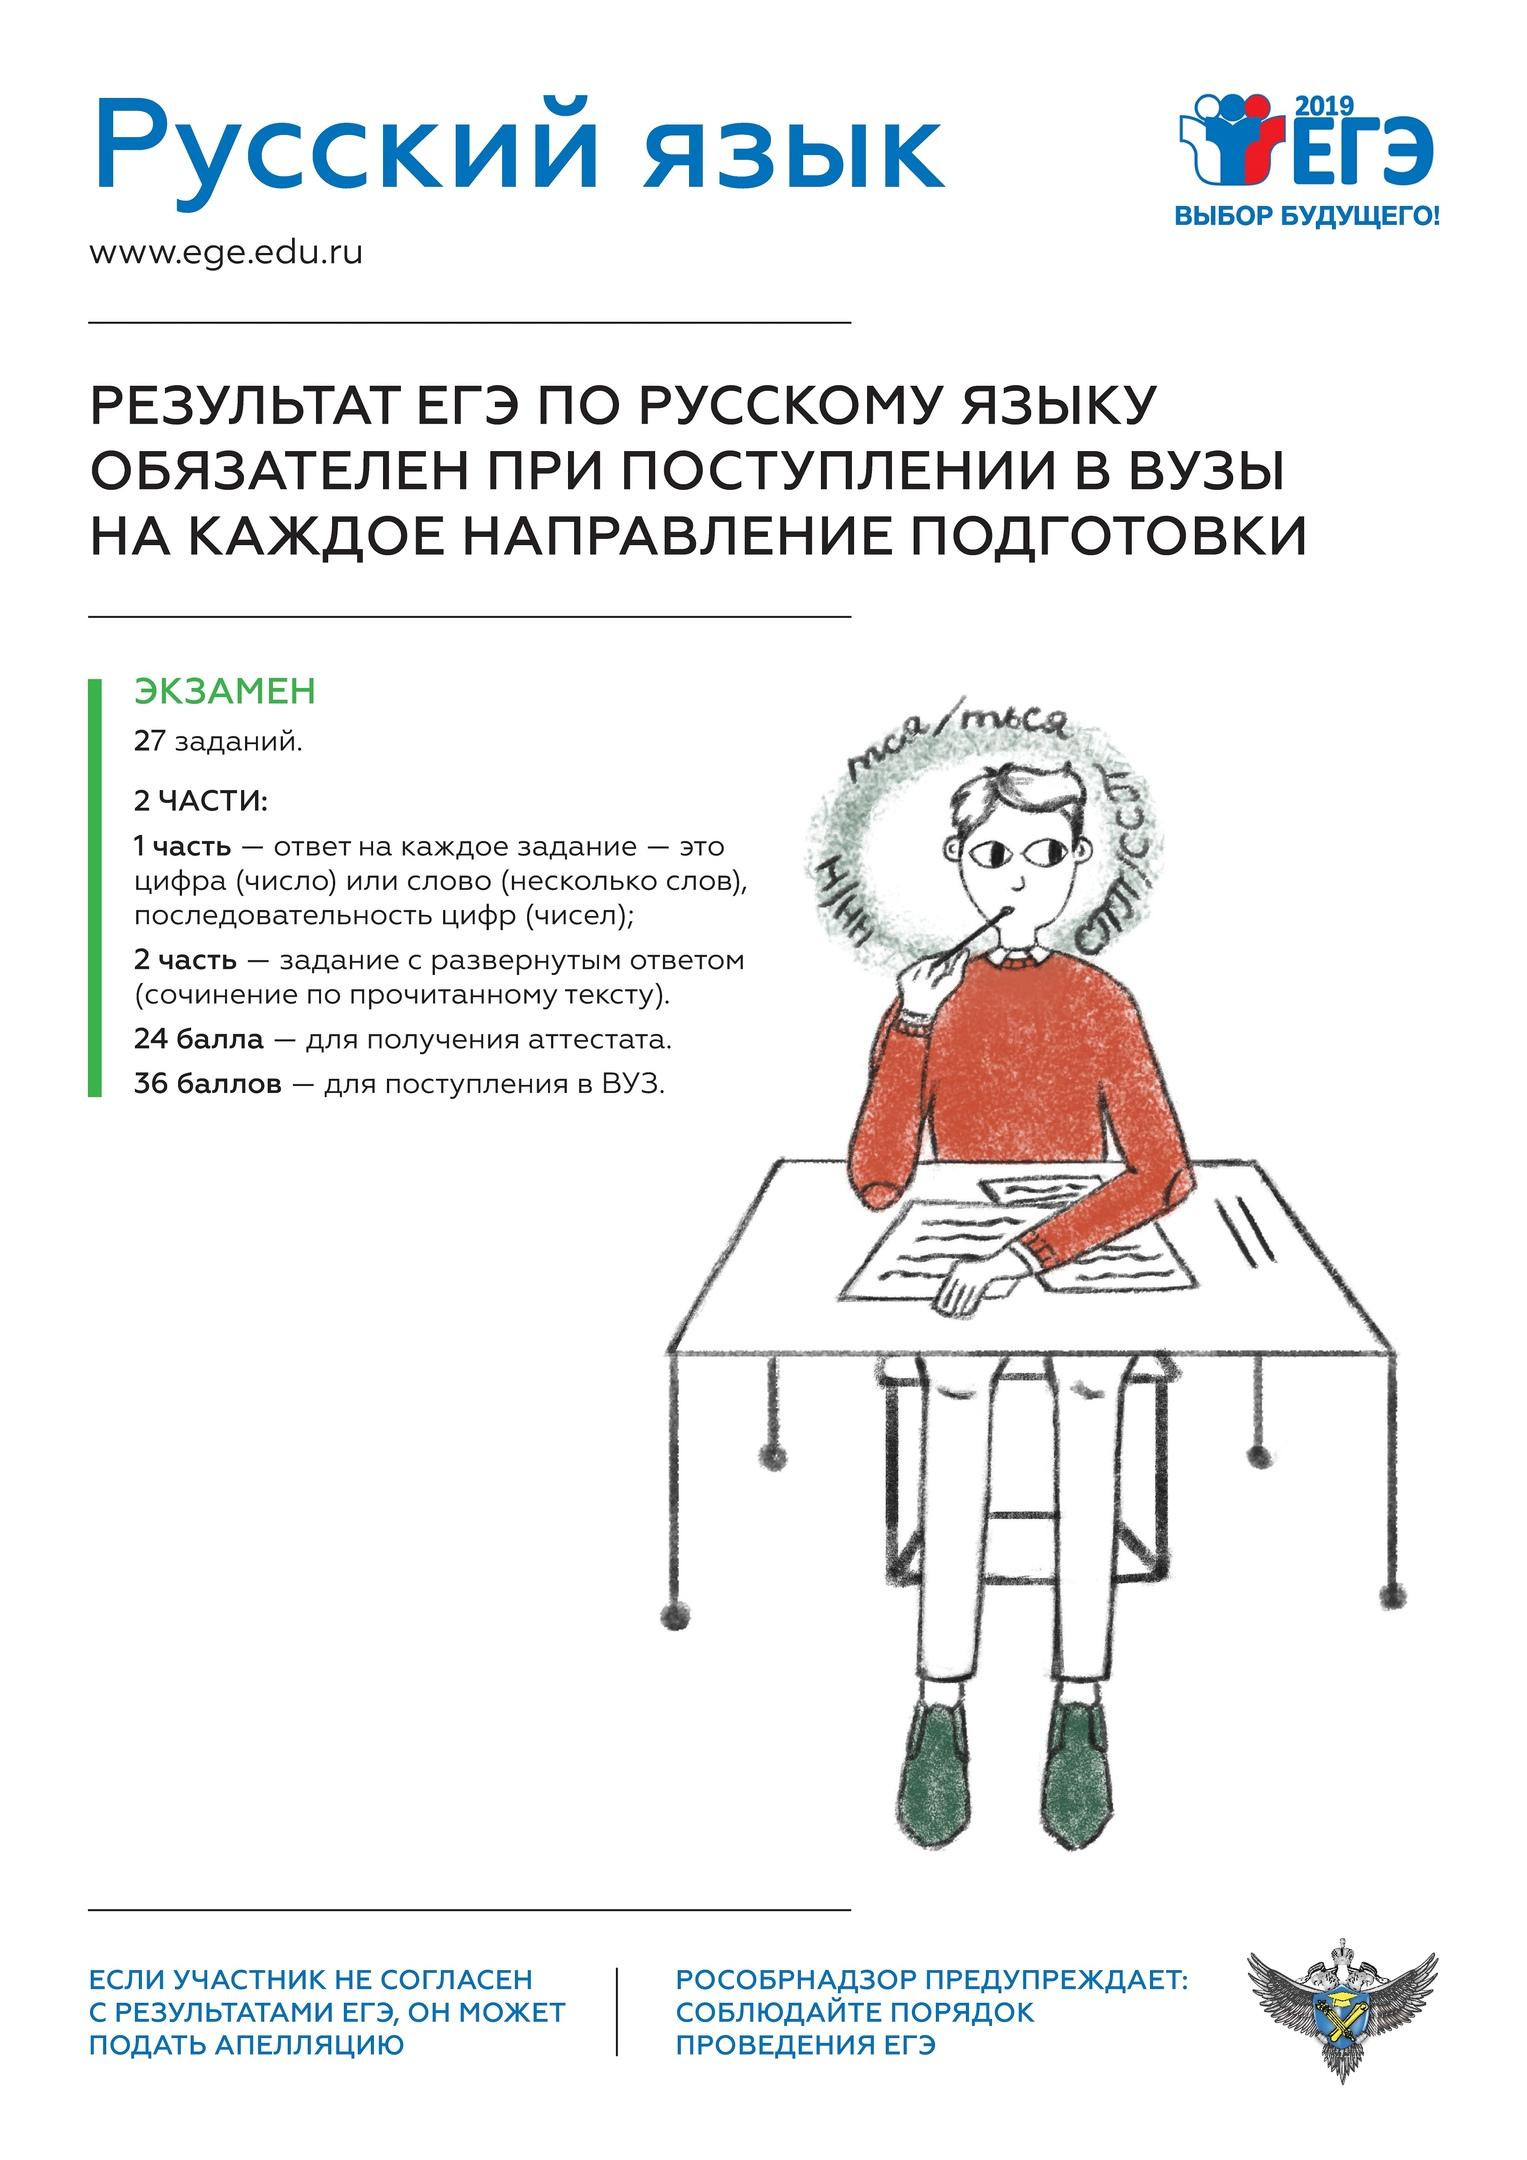 https://pp.userapi.com/c851332/v851332109/fd961/QBm_c7c30JA.jpg